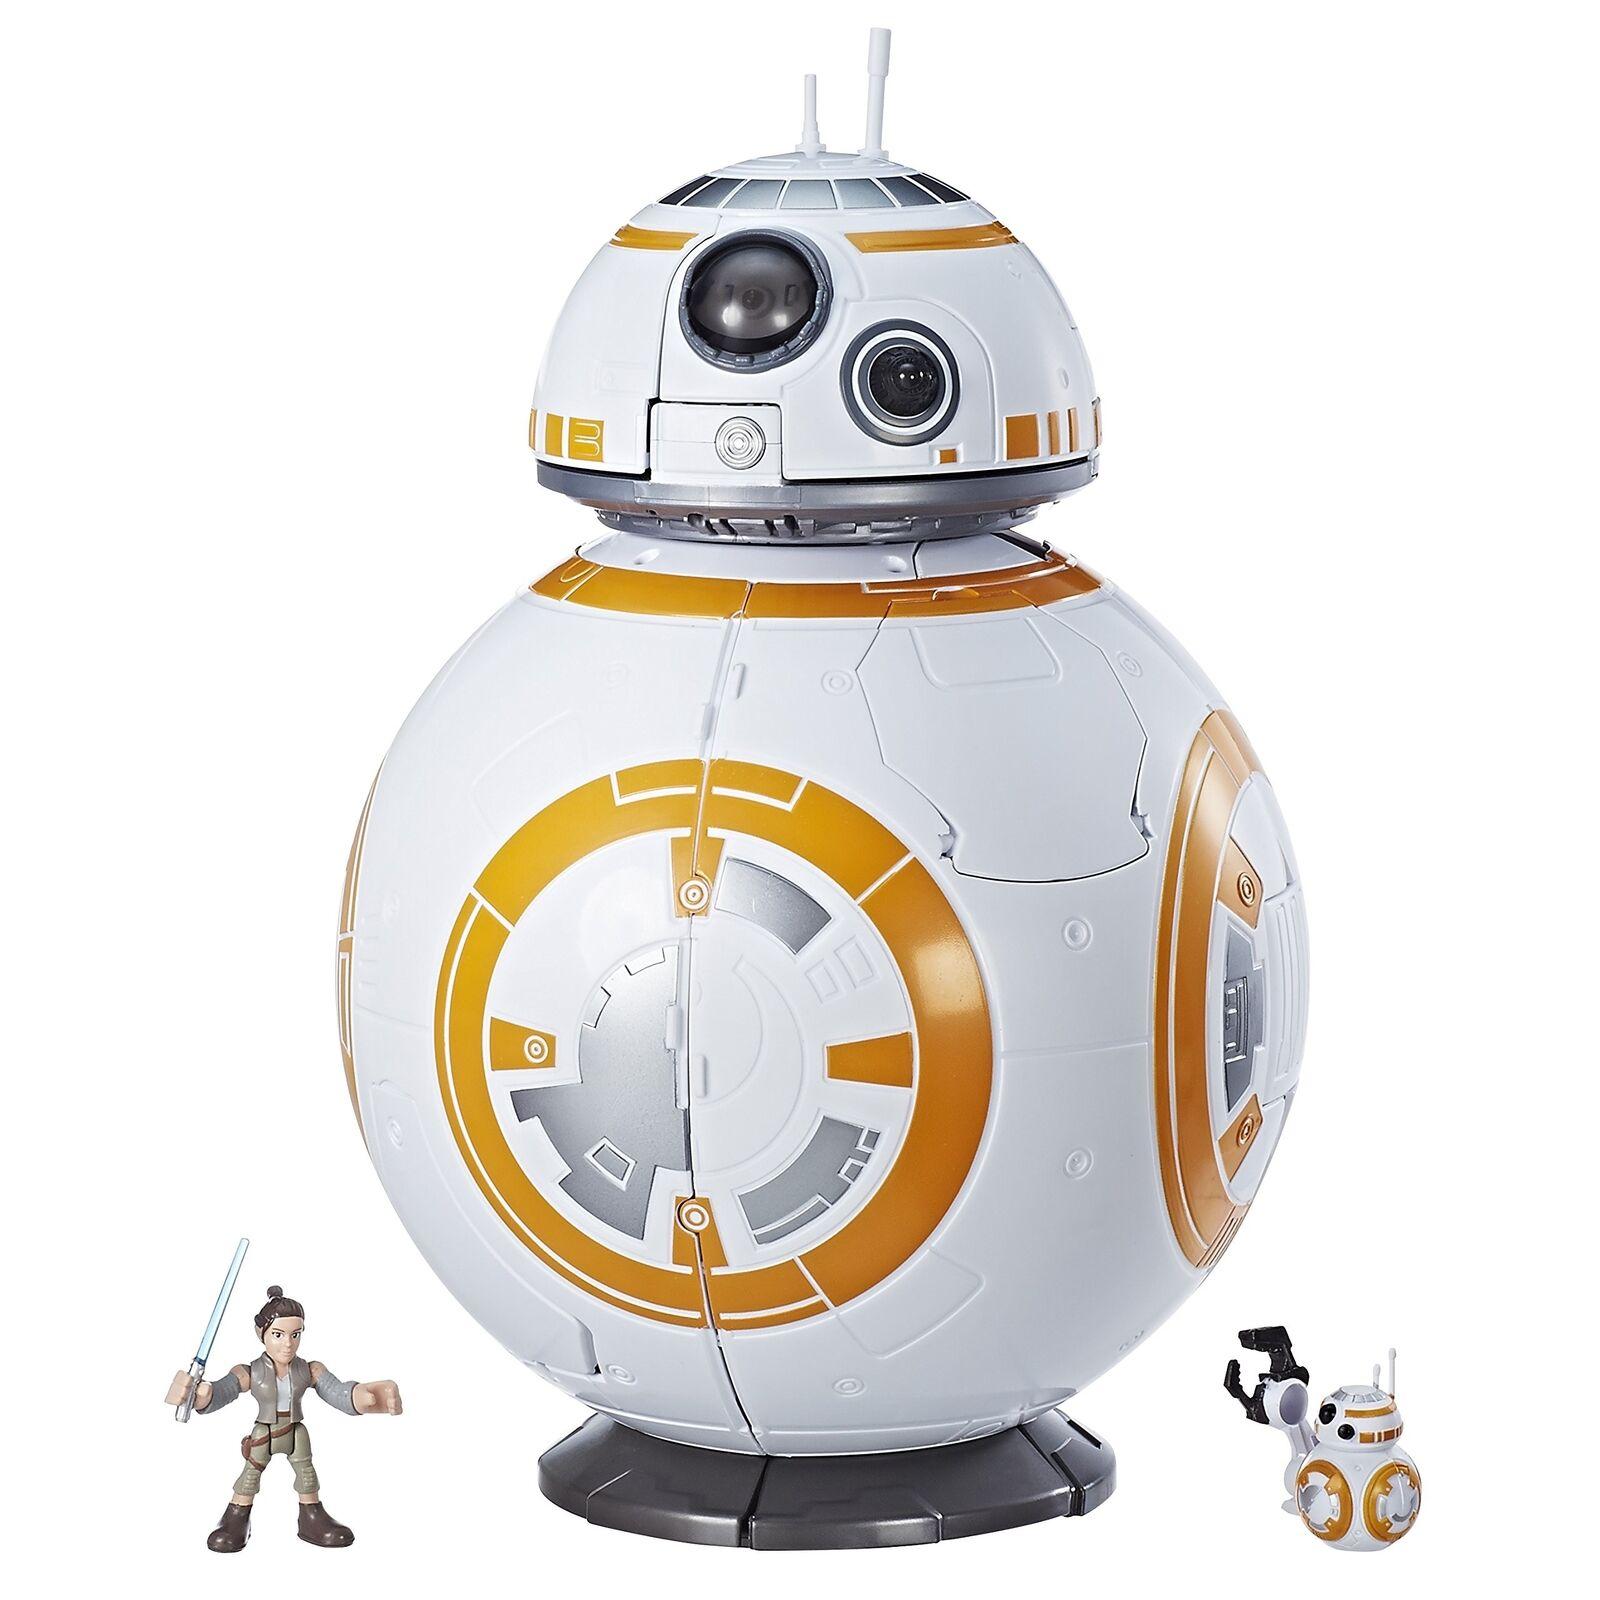 Estrella Wars Jugarskool héroes galáctica BB-8 Aventura Figura De Base